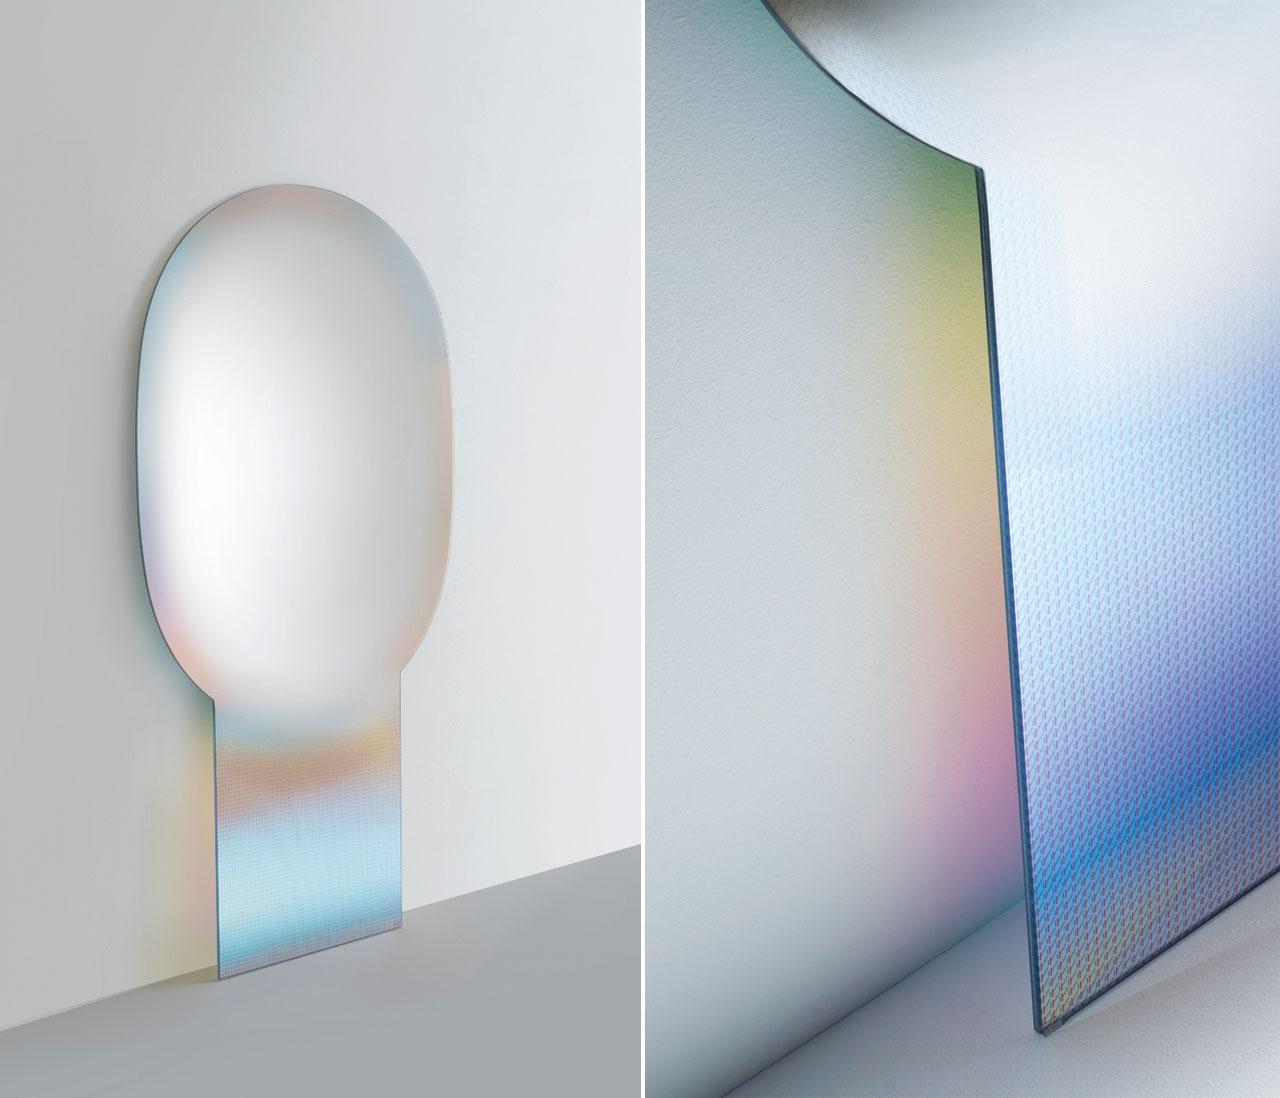 27_shimmer-mirrors_patriciaurquiola_glas_italia_yatzer_mdw16_0.jpg